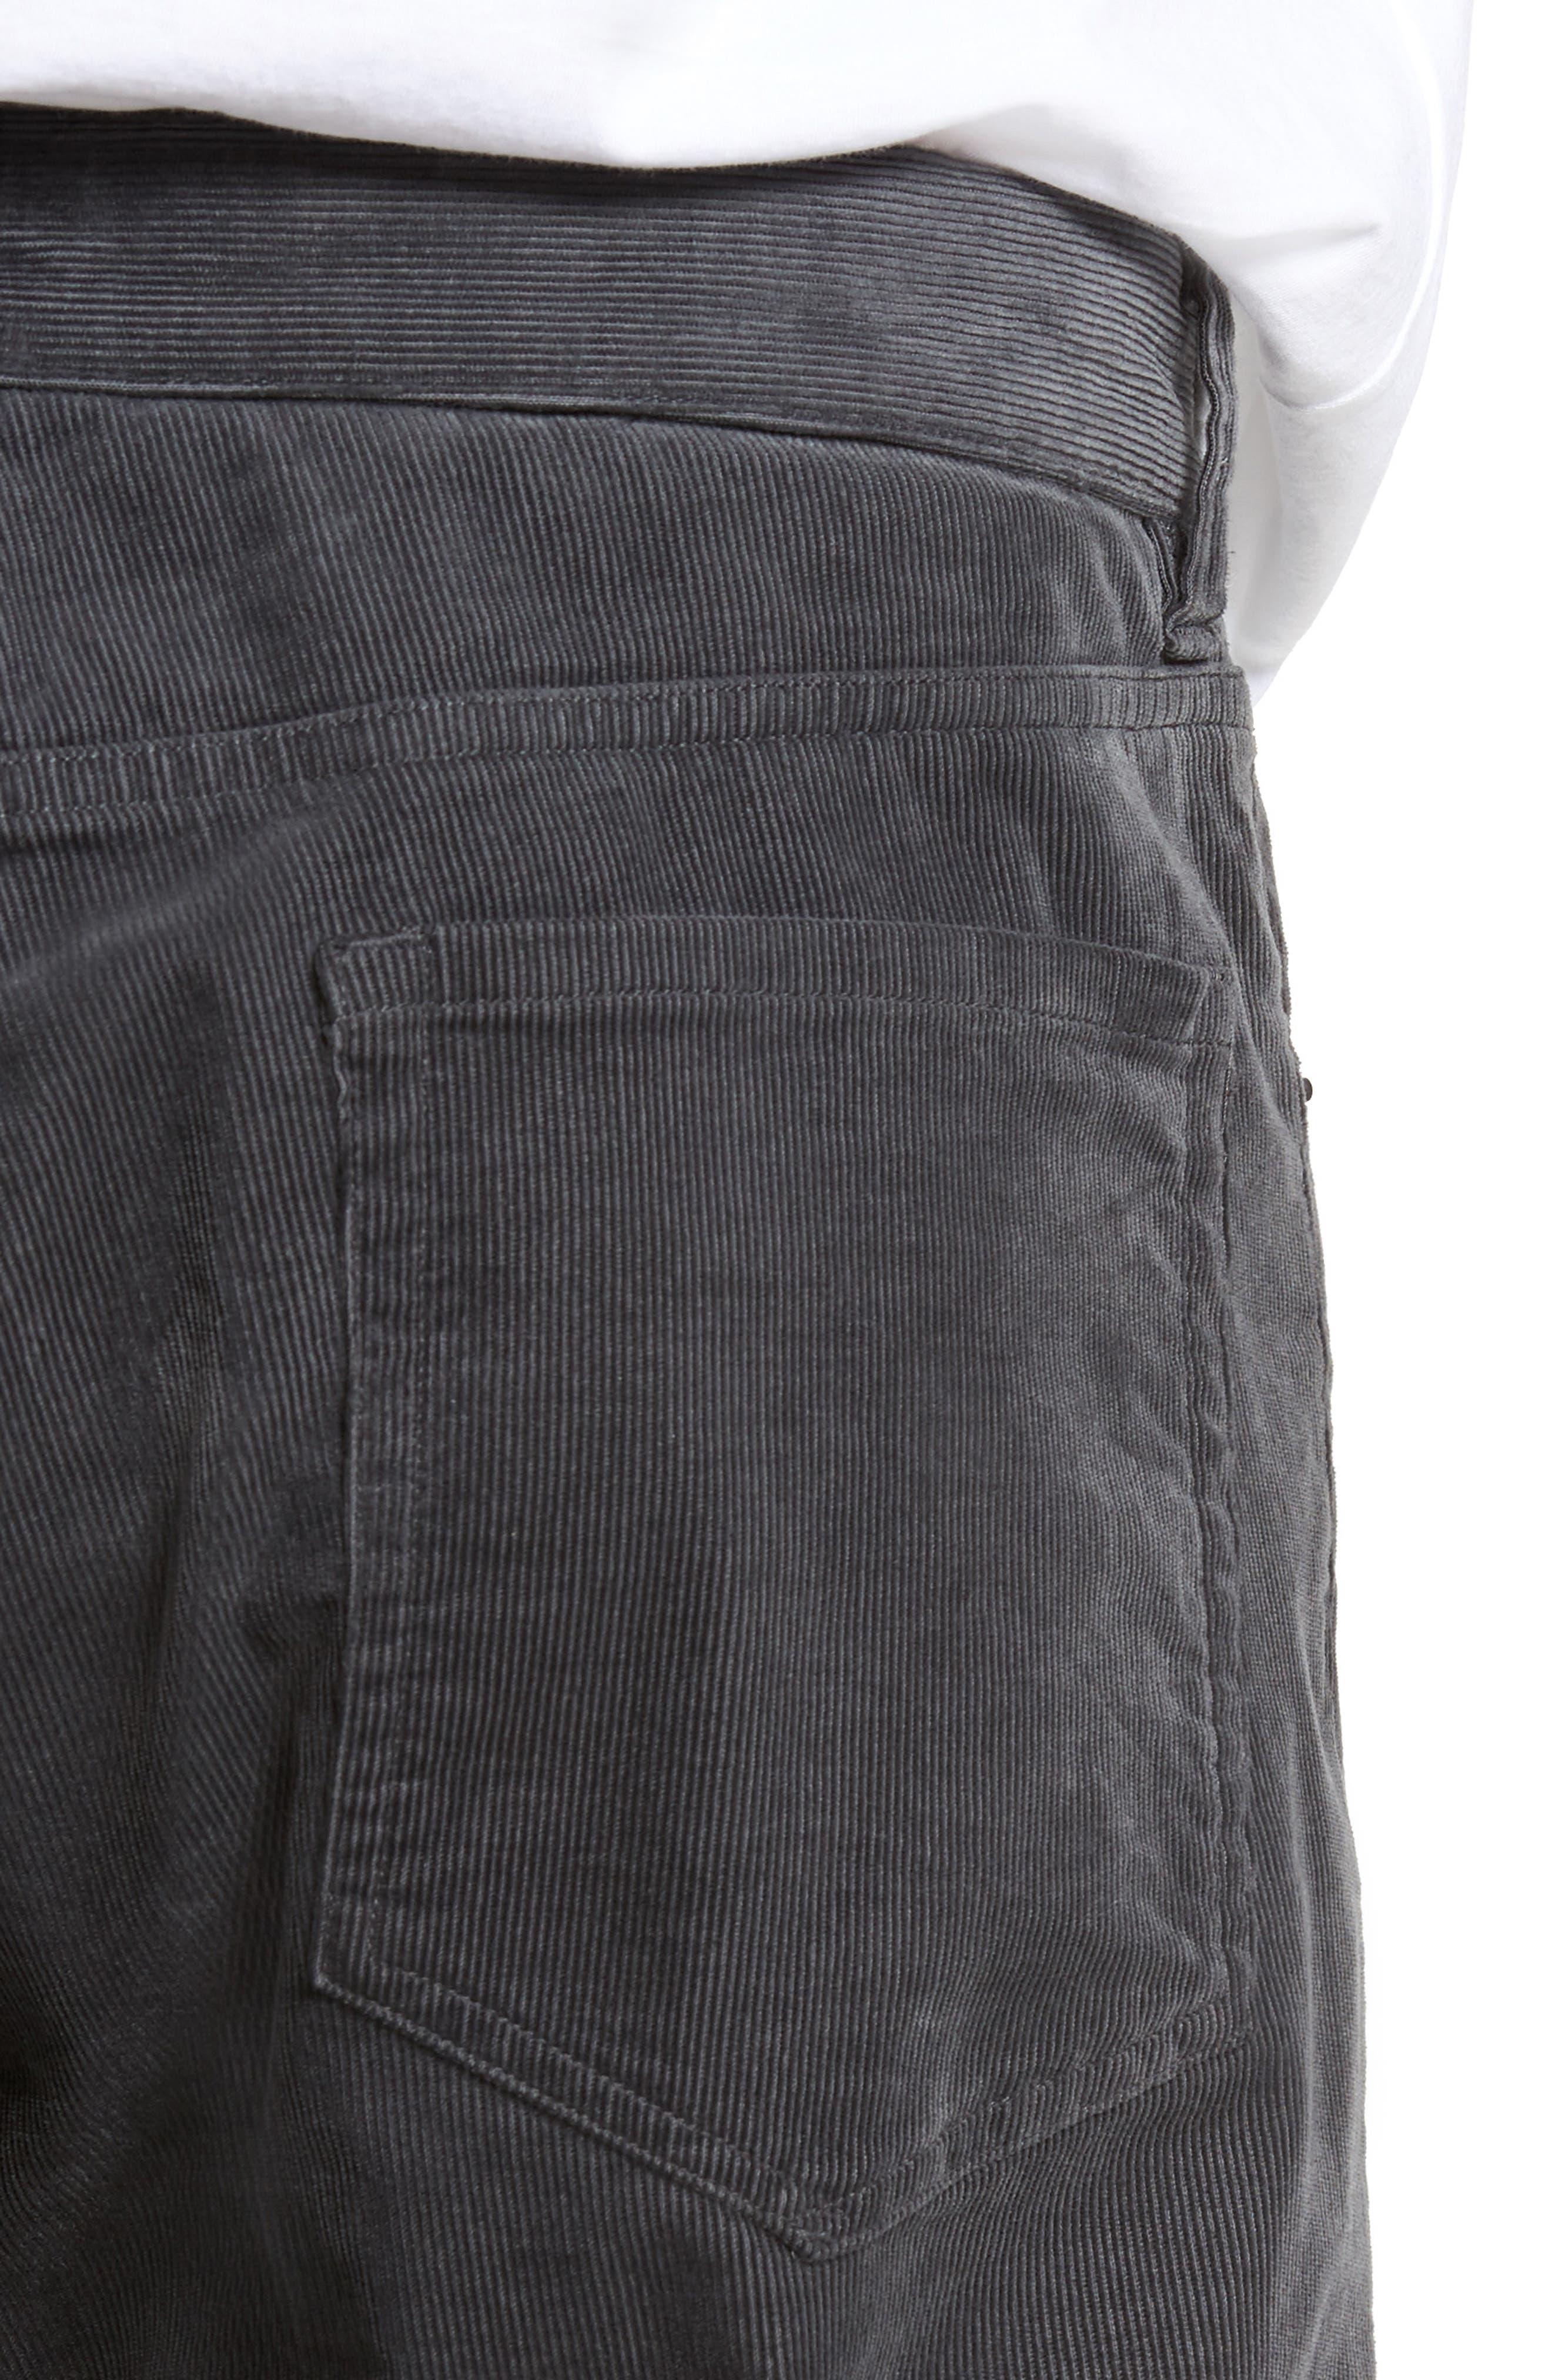 Five-Pocket Stretch Corduroy Pants,                             Alternate thumbnail 4, color,                             Granite